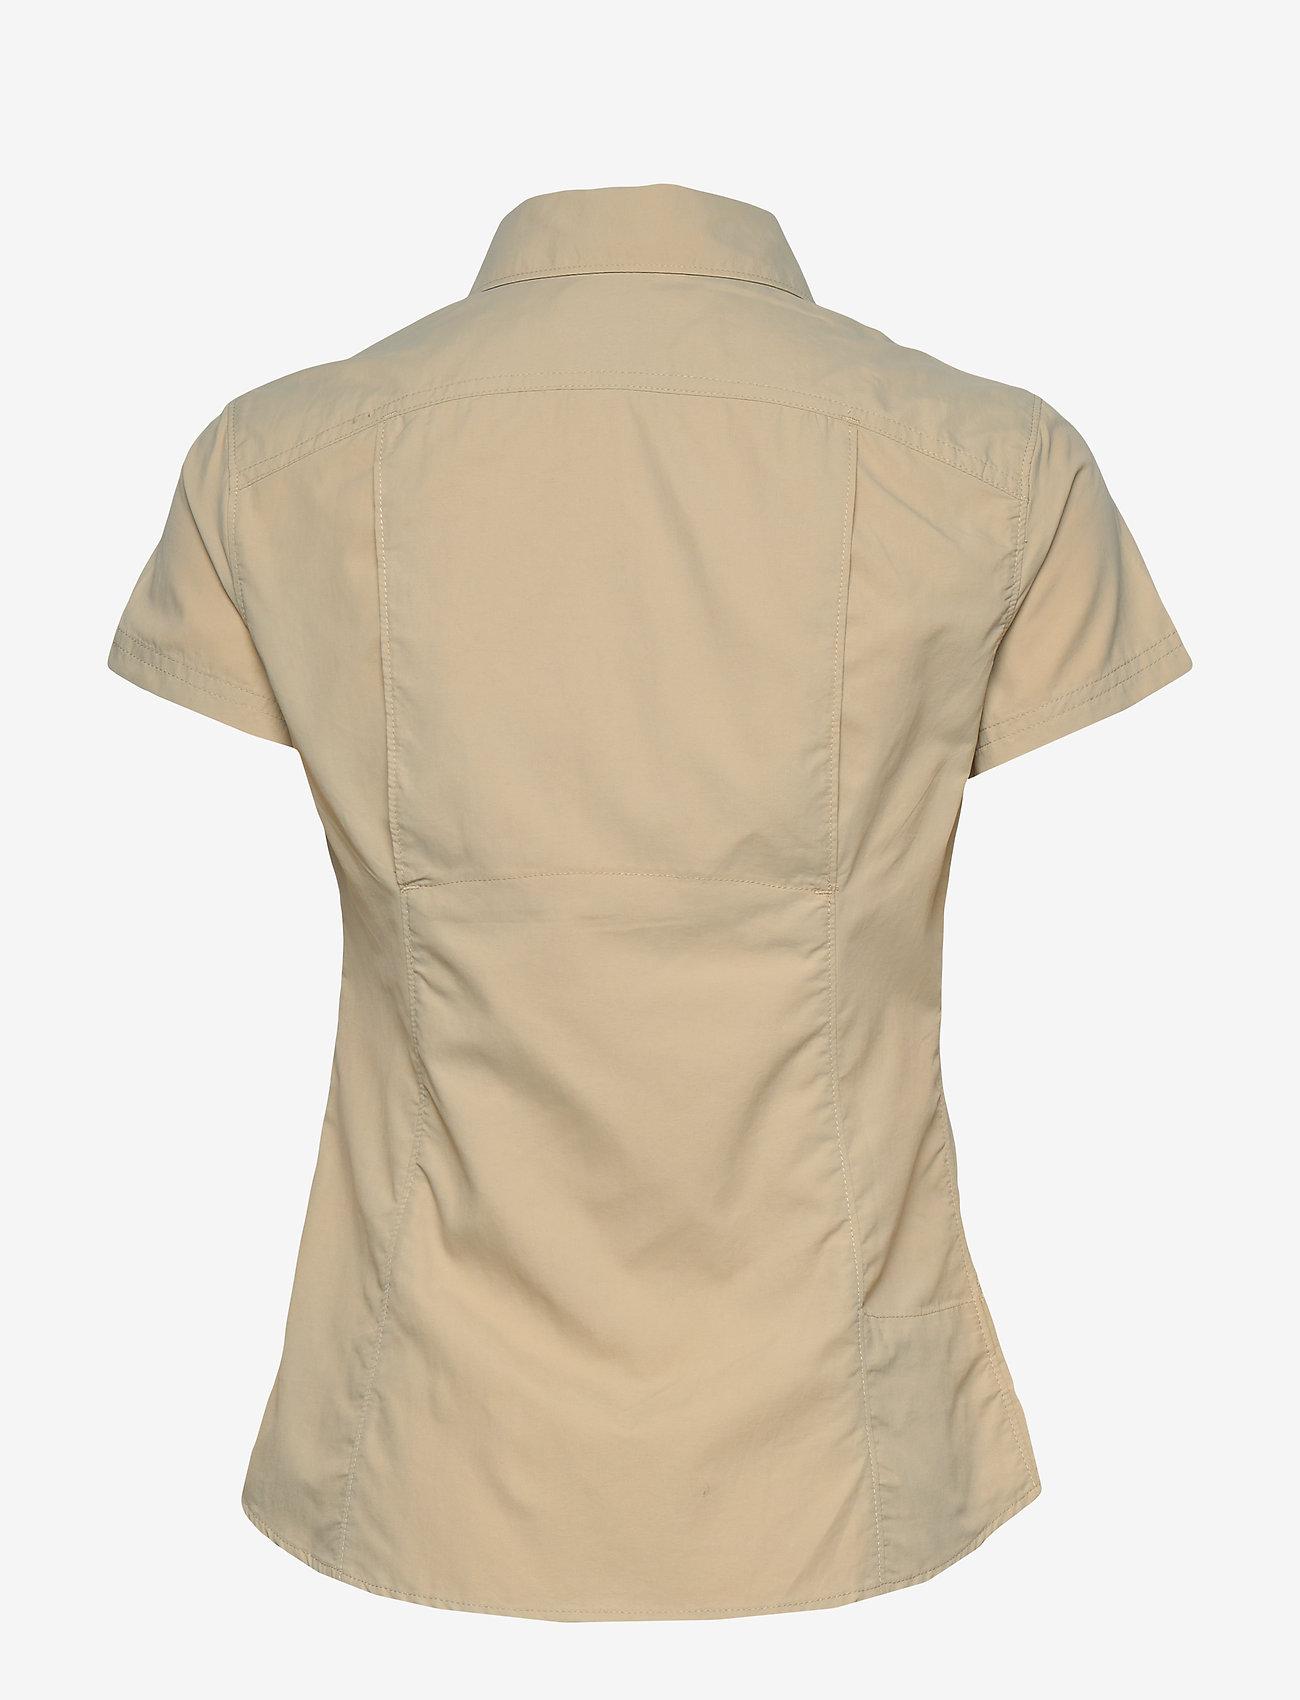 Columbia - Silver Ridge™ 2.0 Short Sleeve - overhemden met korte mouwen - fossil - 1